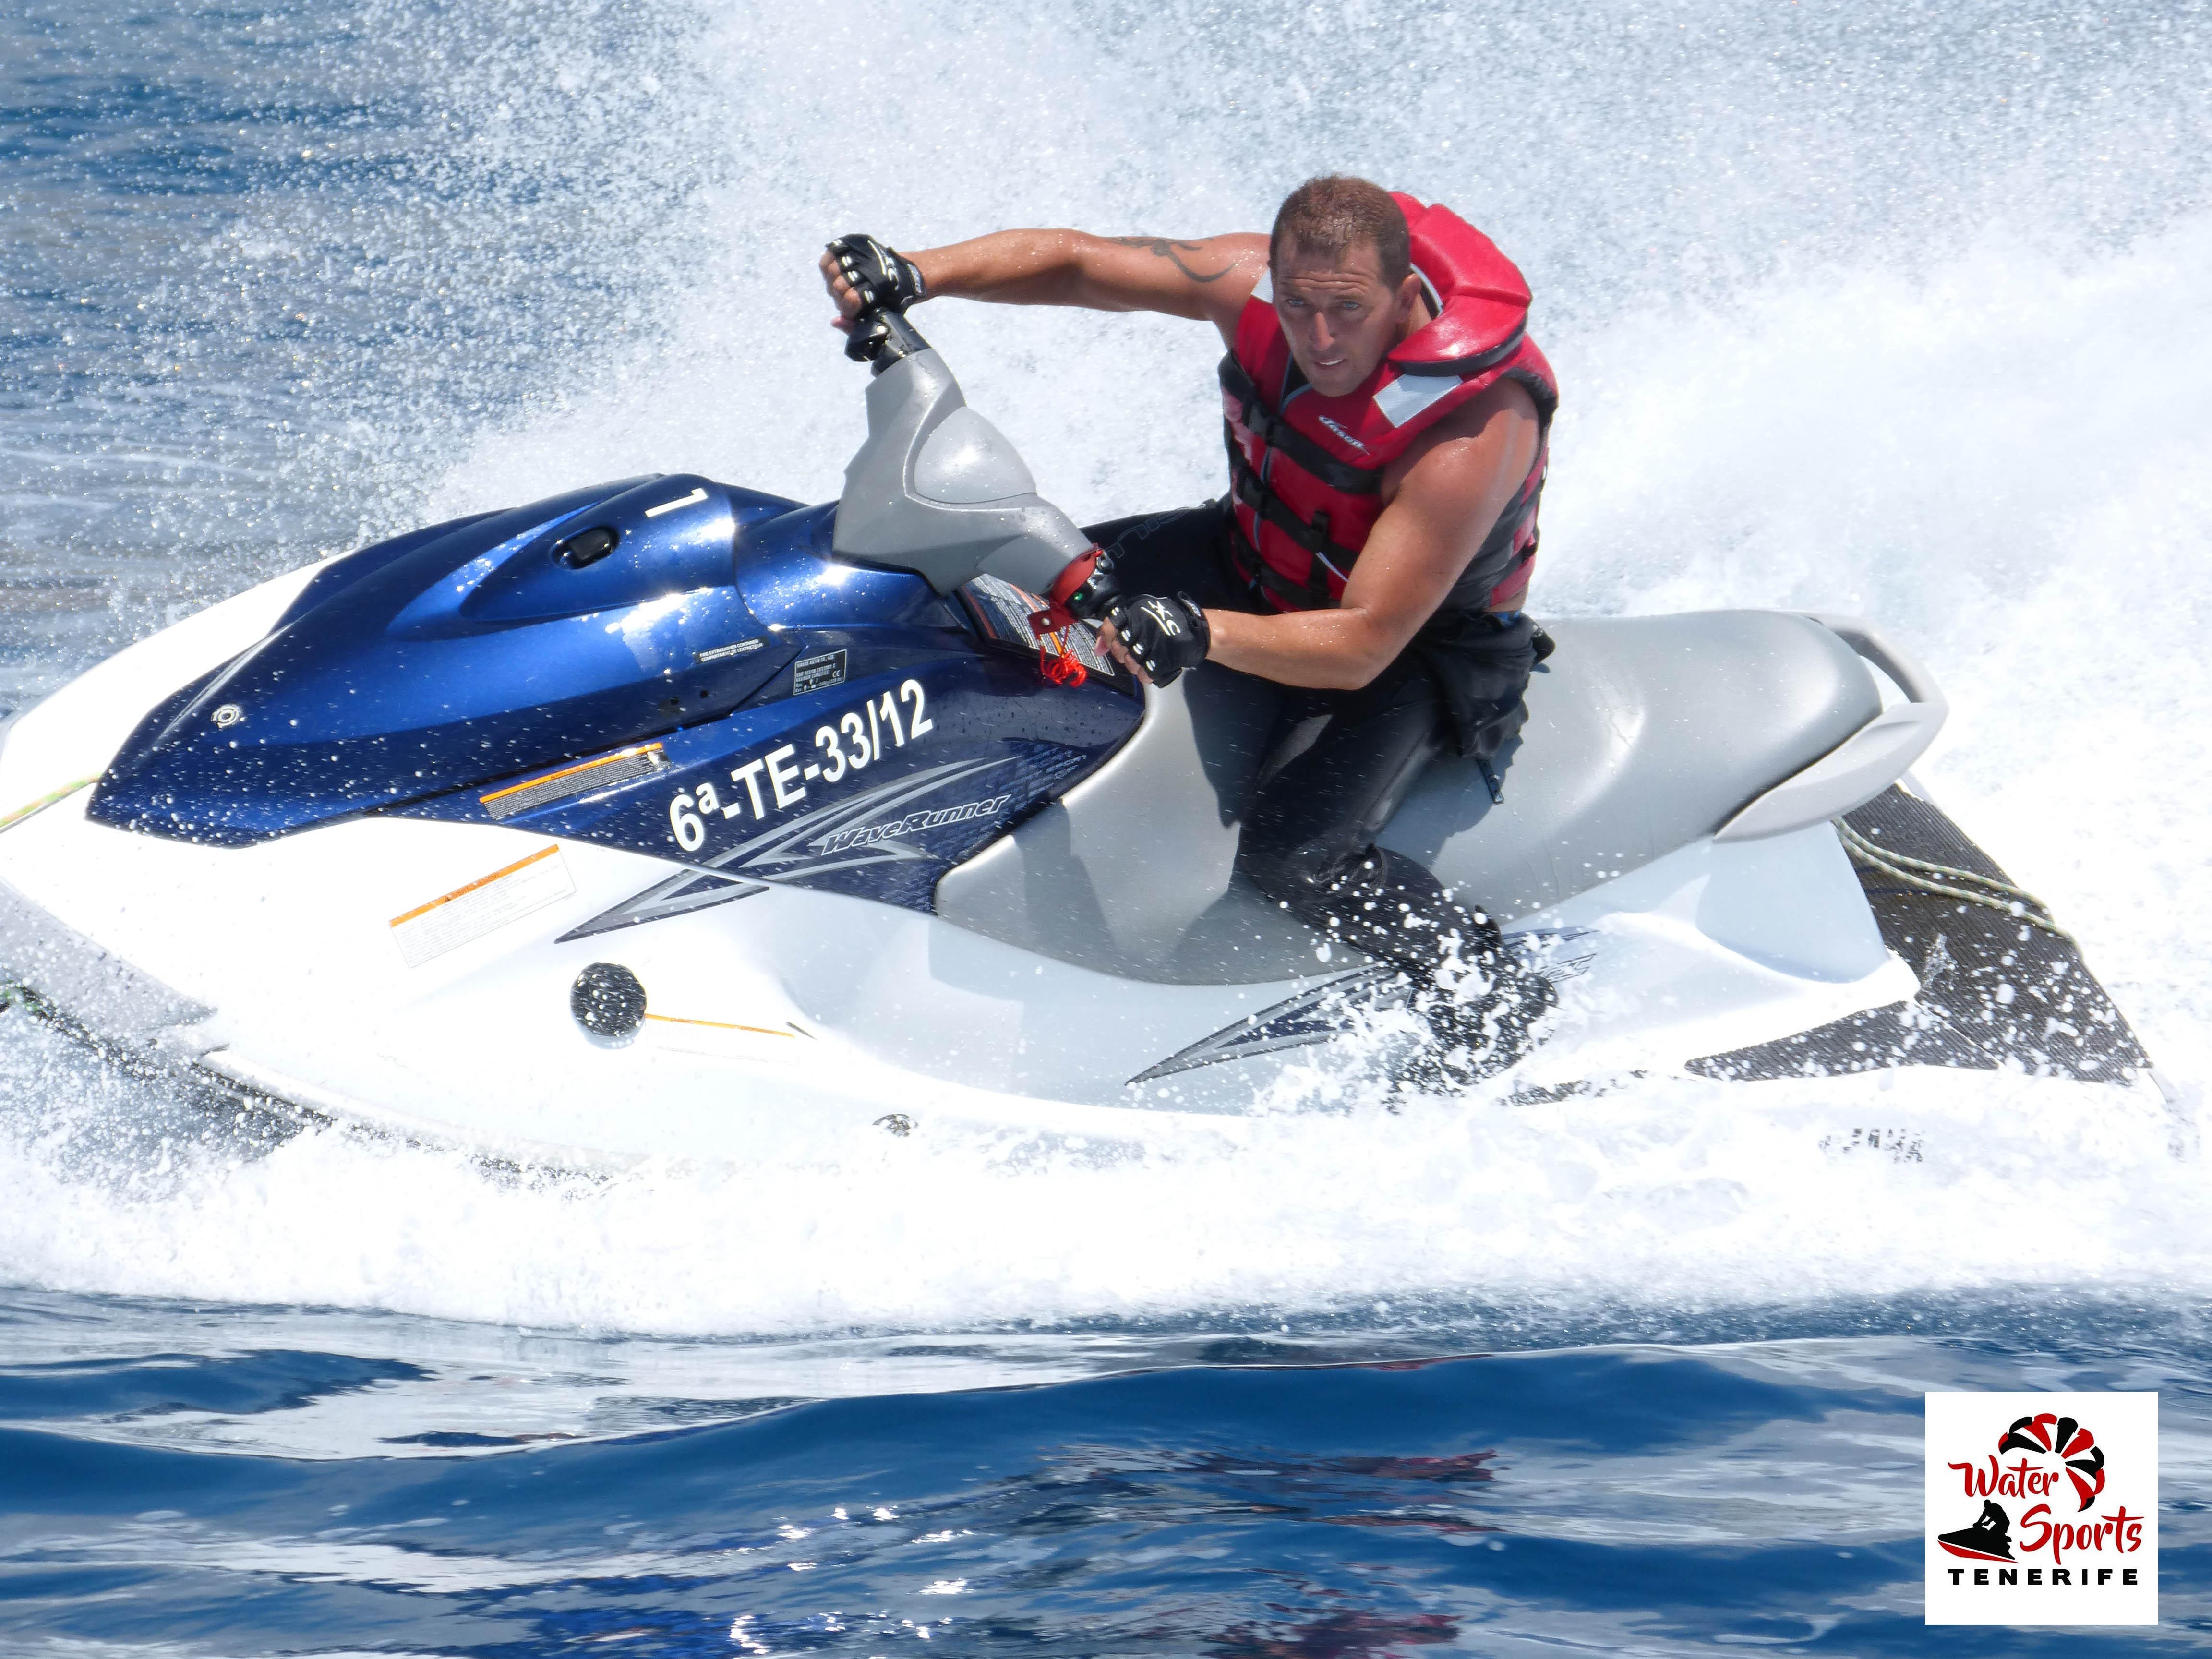 alquiler de motos acuaticas jet ski motos de agua jet bike en fañabe el medano